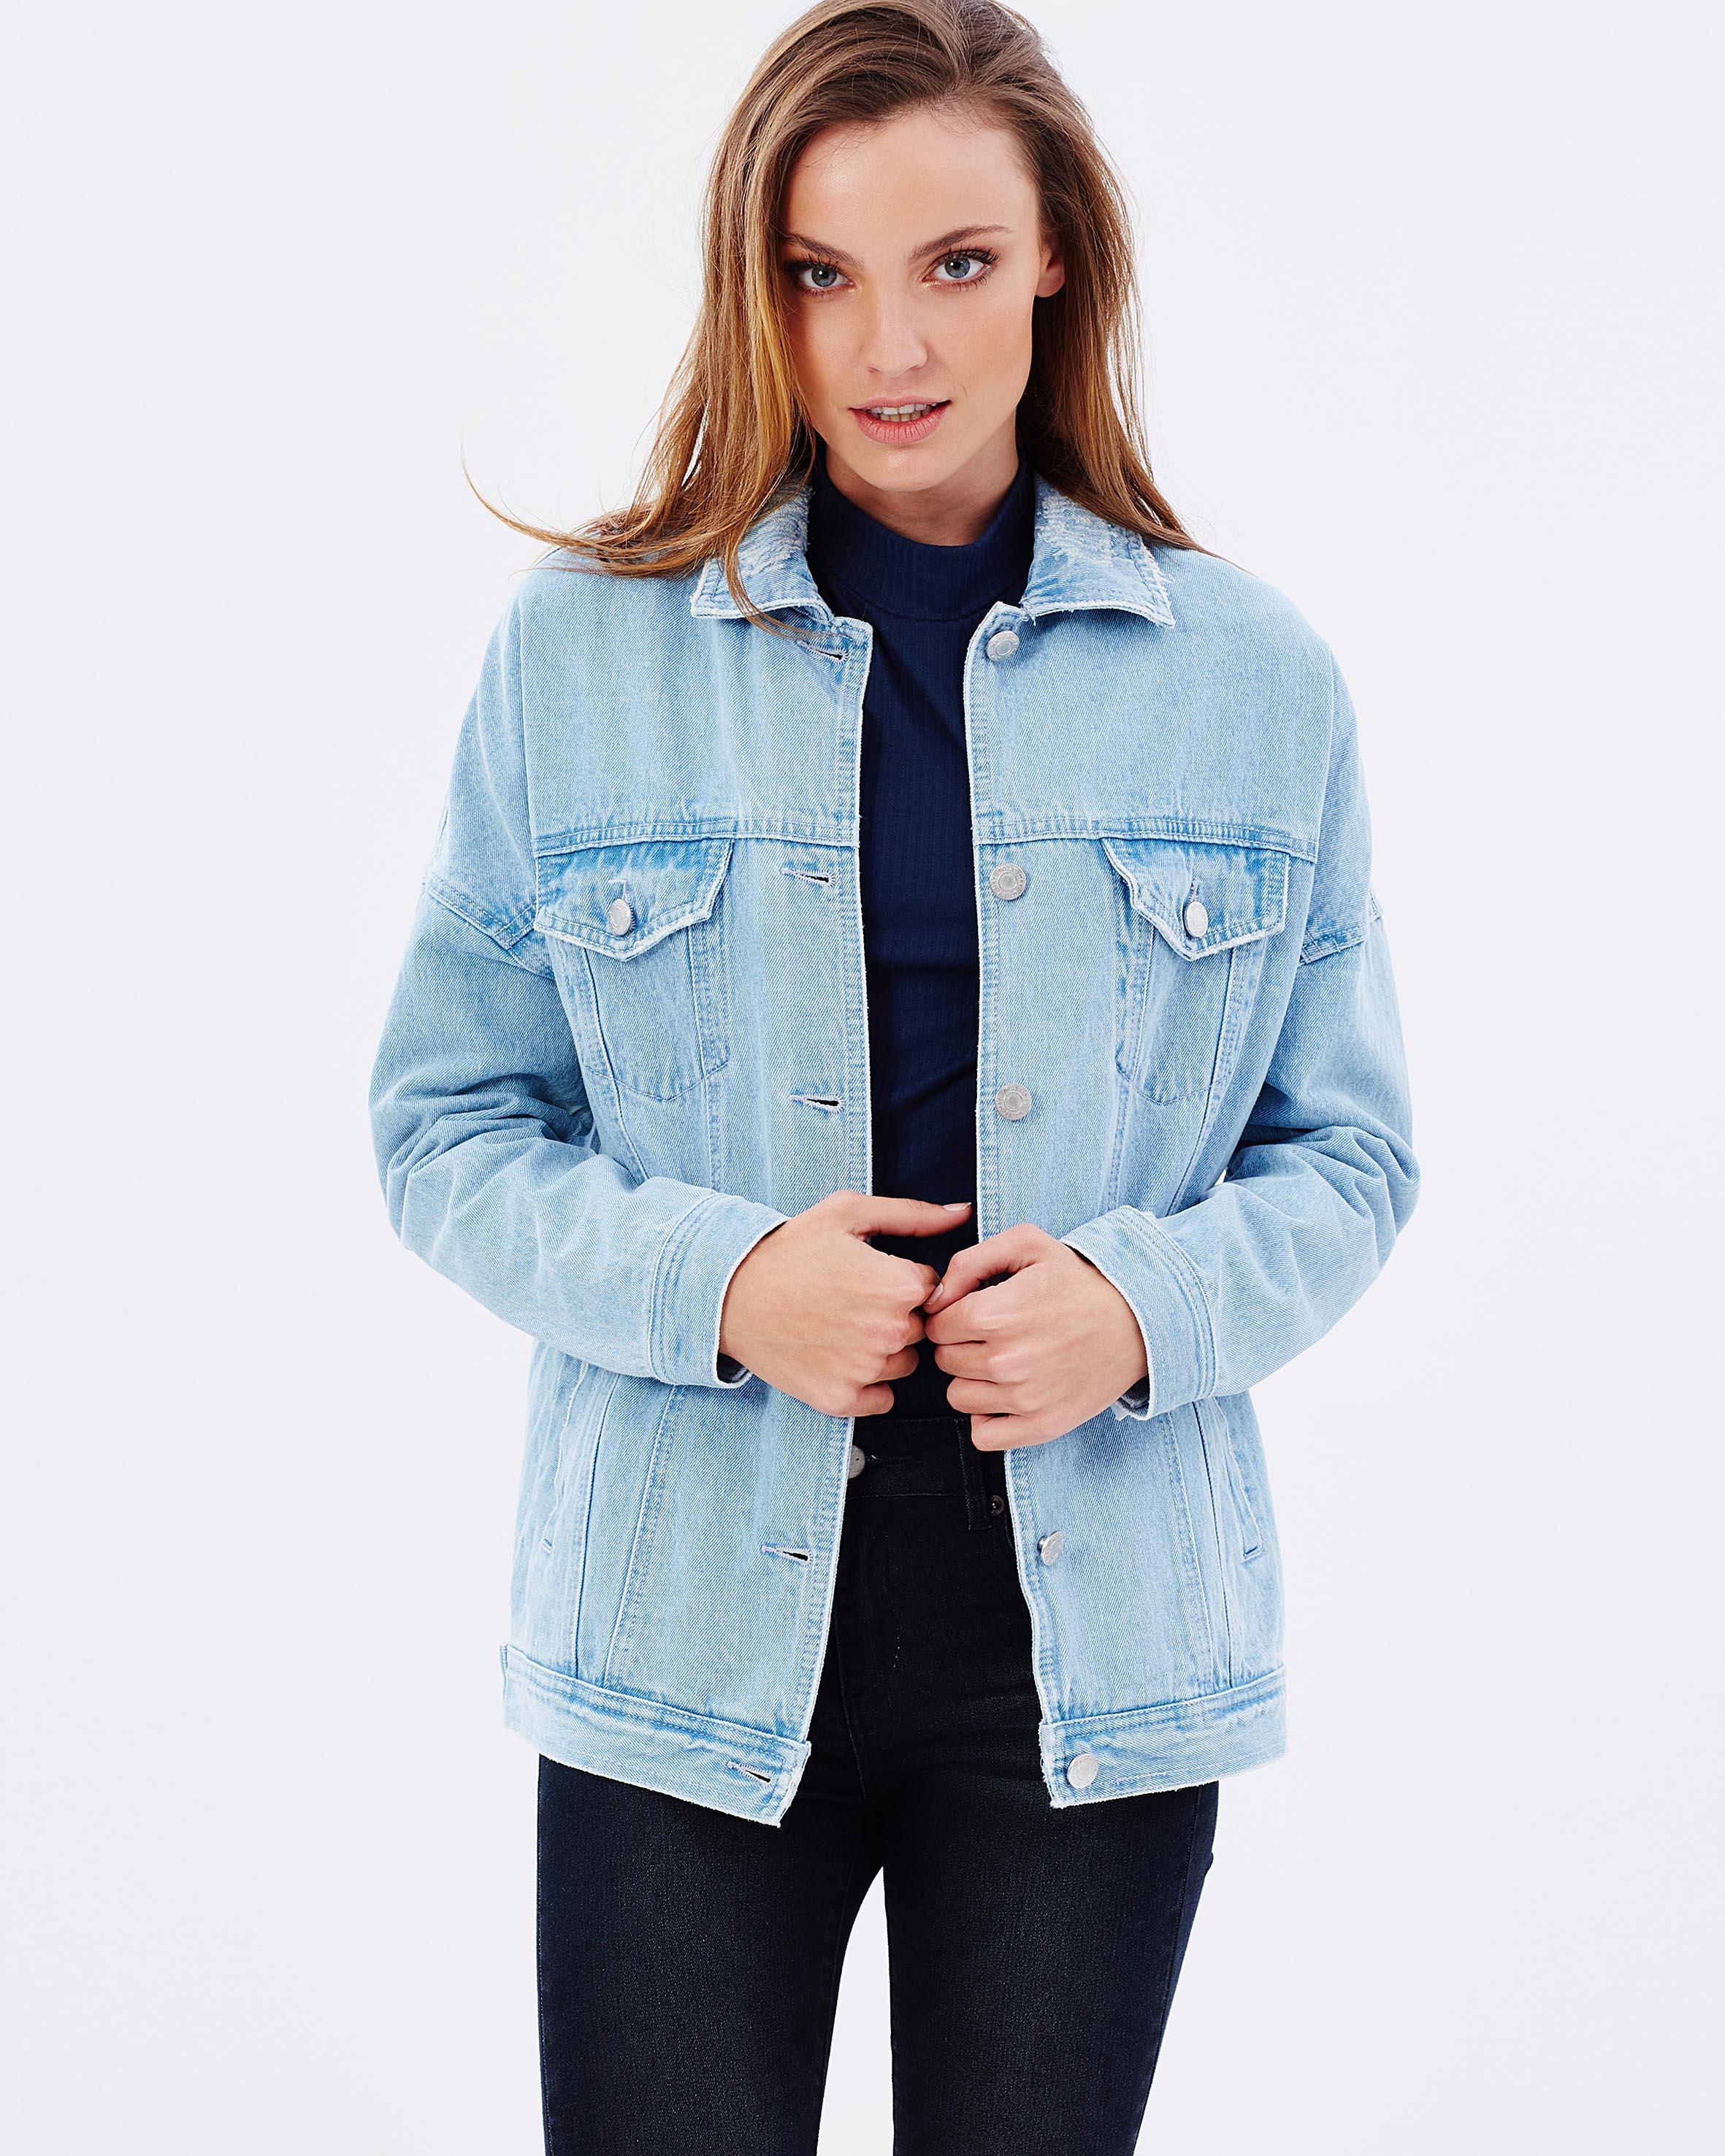 Denim Jacket Buy Online ng2LwJ